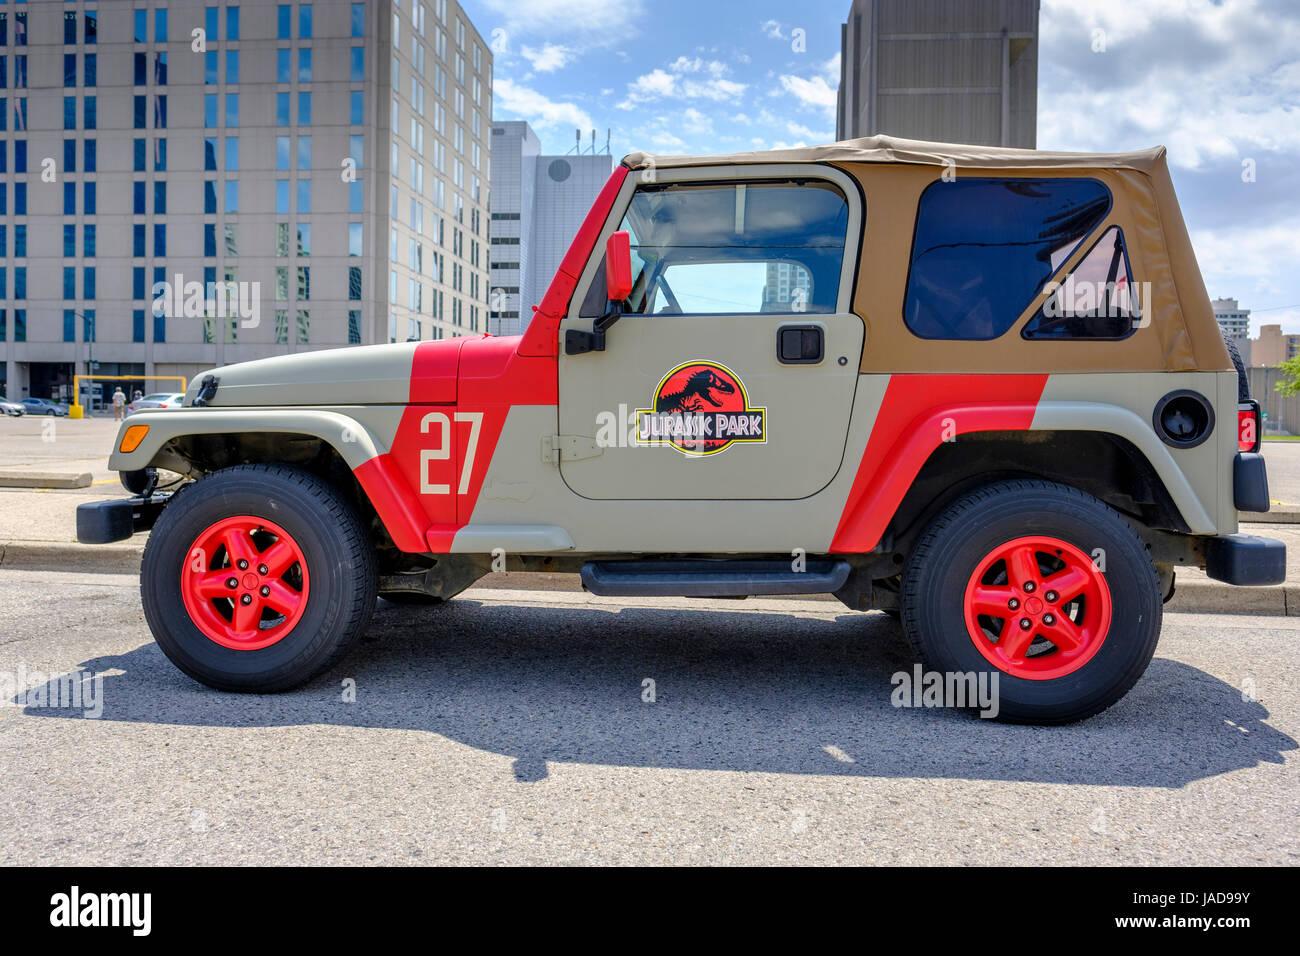 jurassic park jeep stock photos & jurassic park jeep stock images